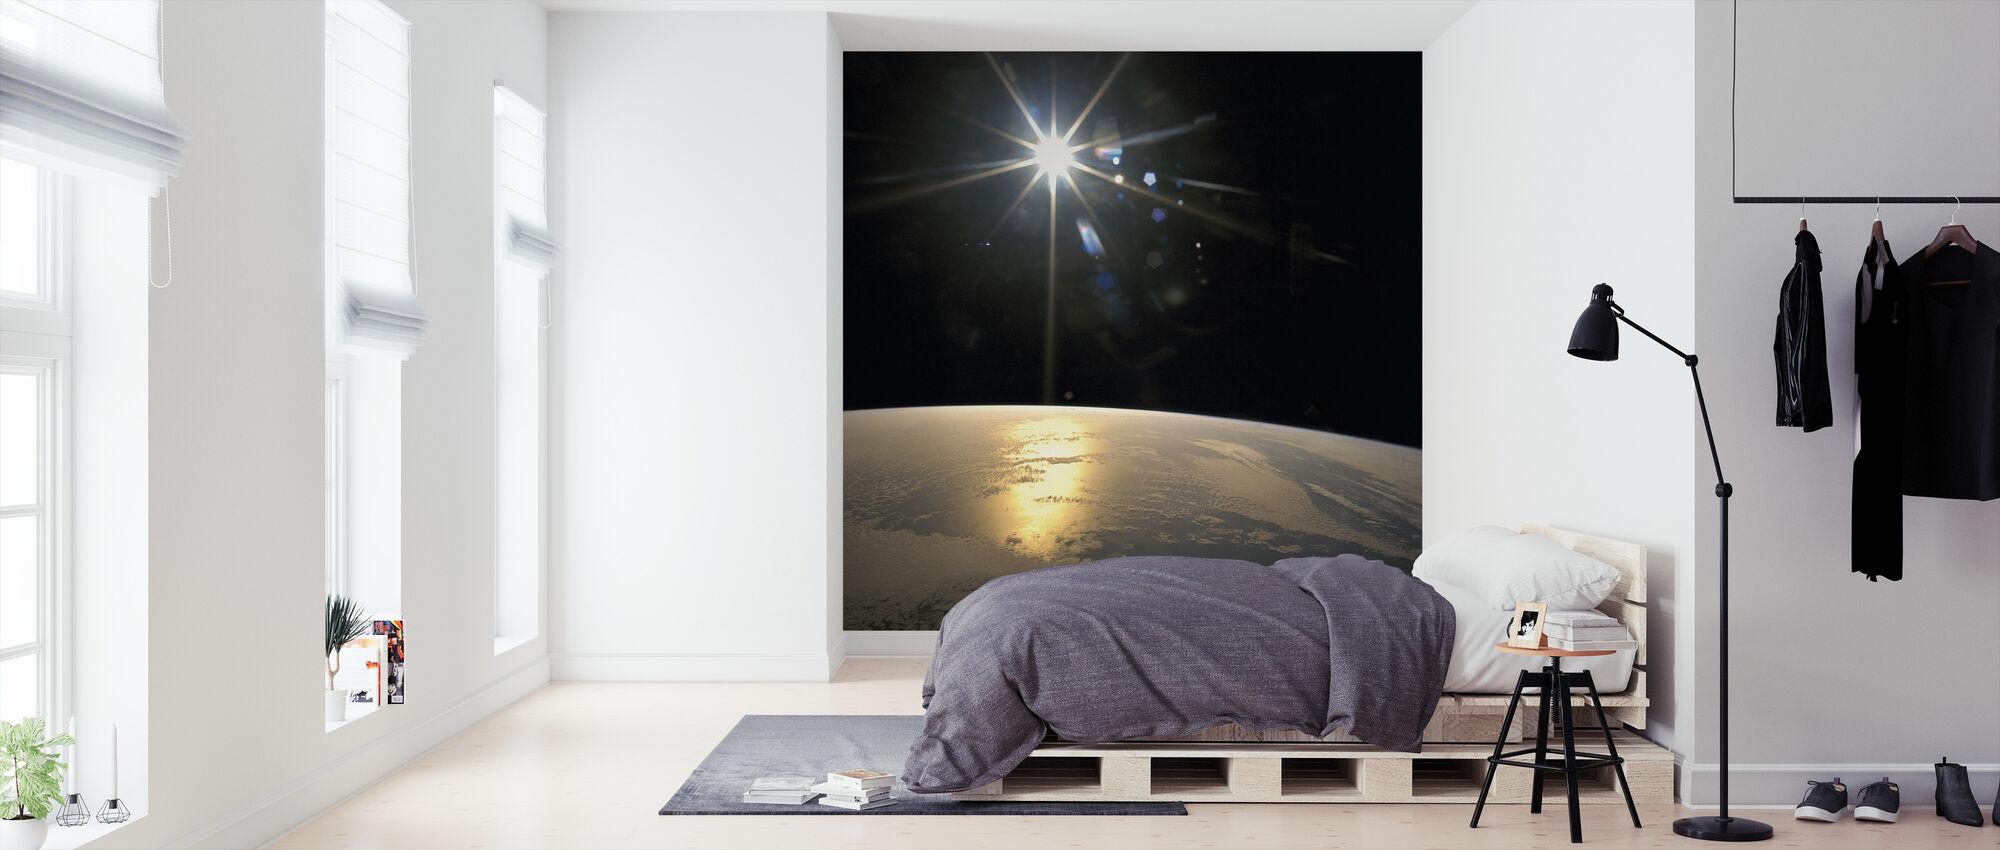 Sunrays Falling on Earth - Wallpaper - Bedroom